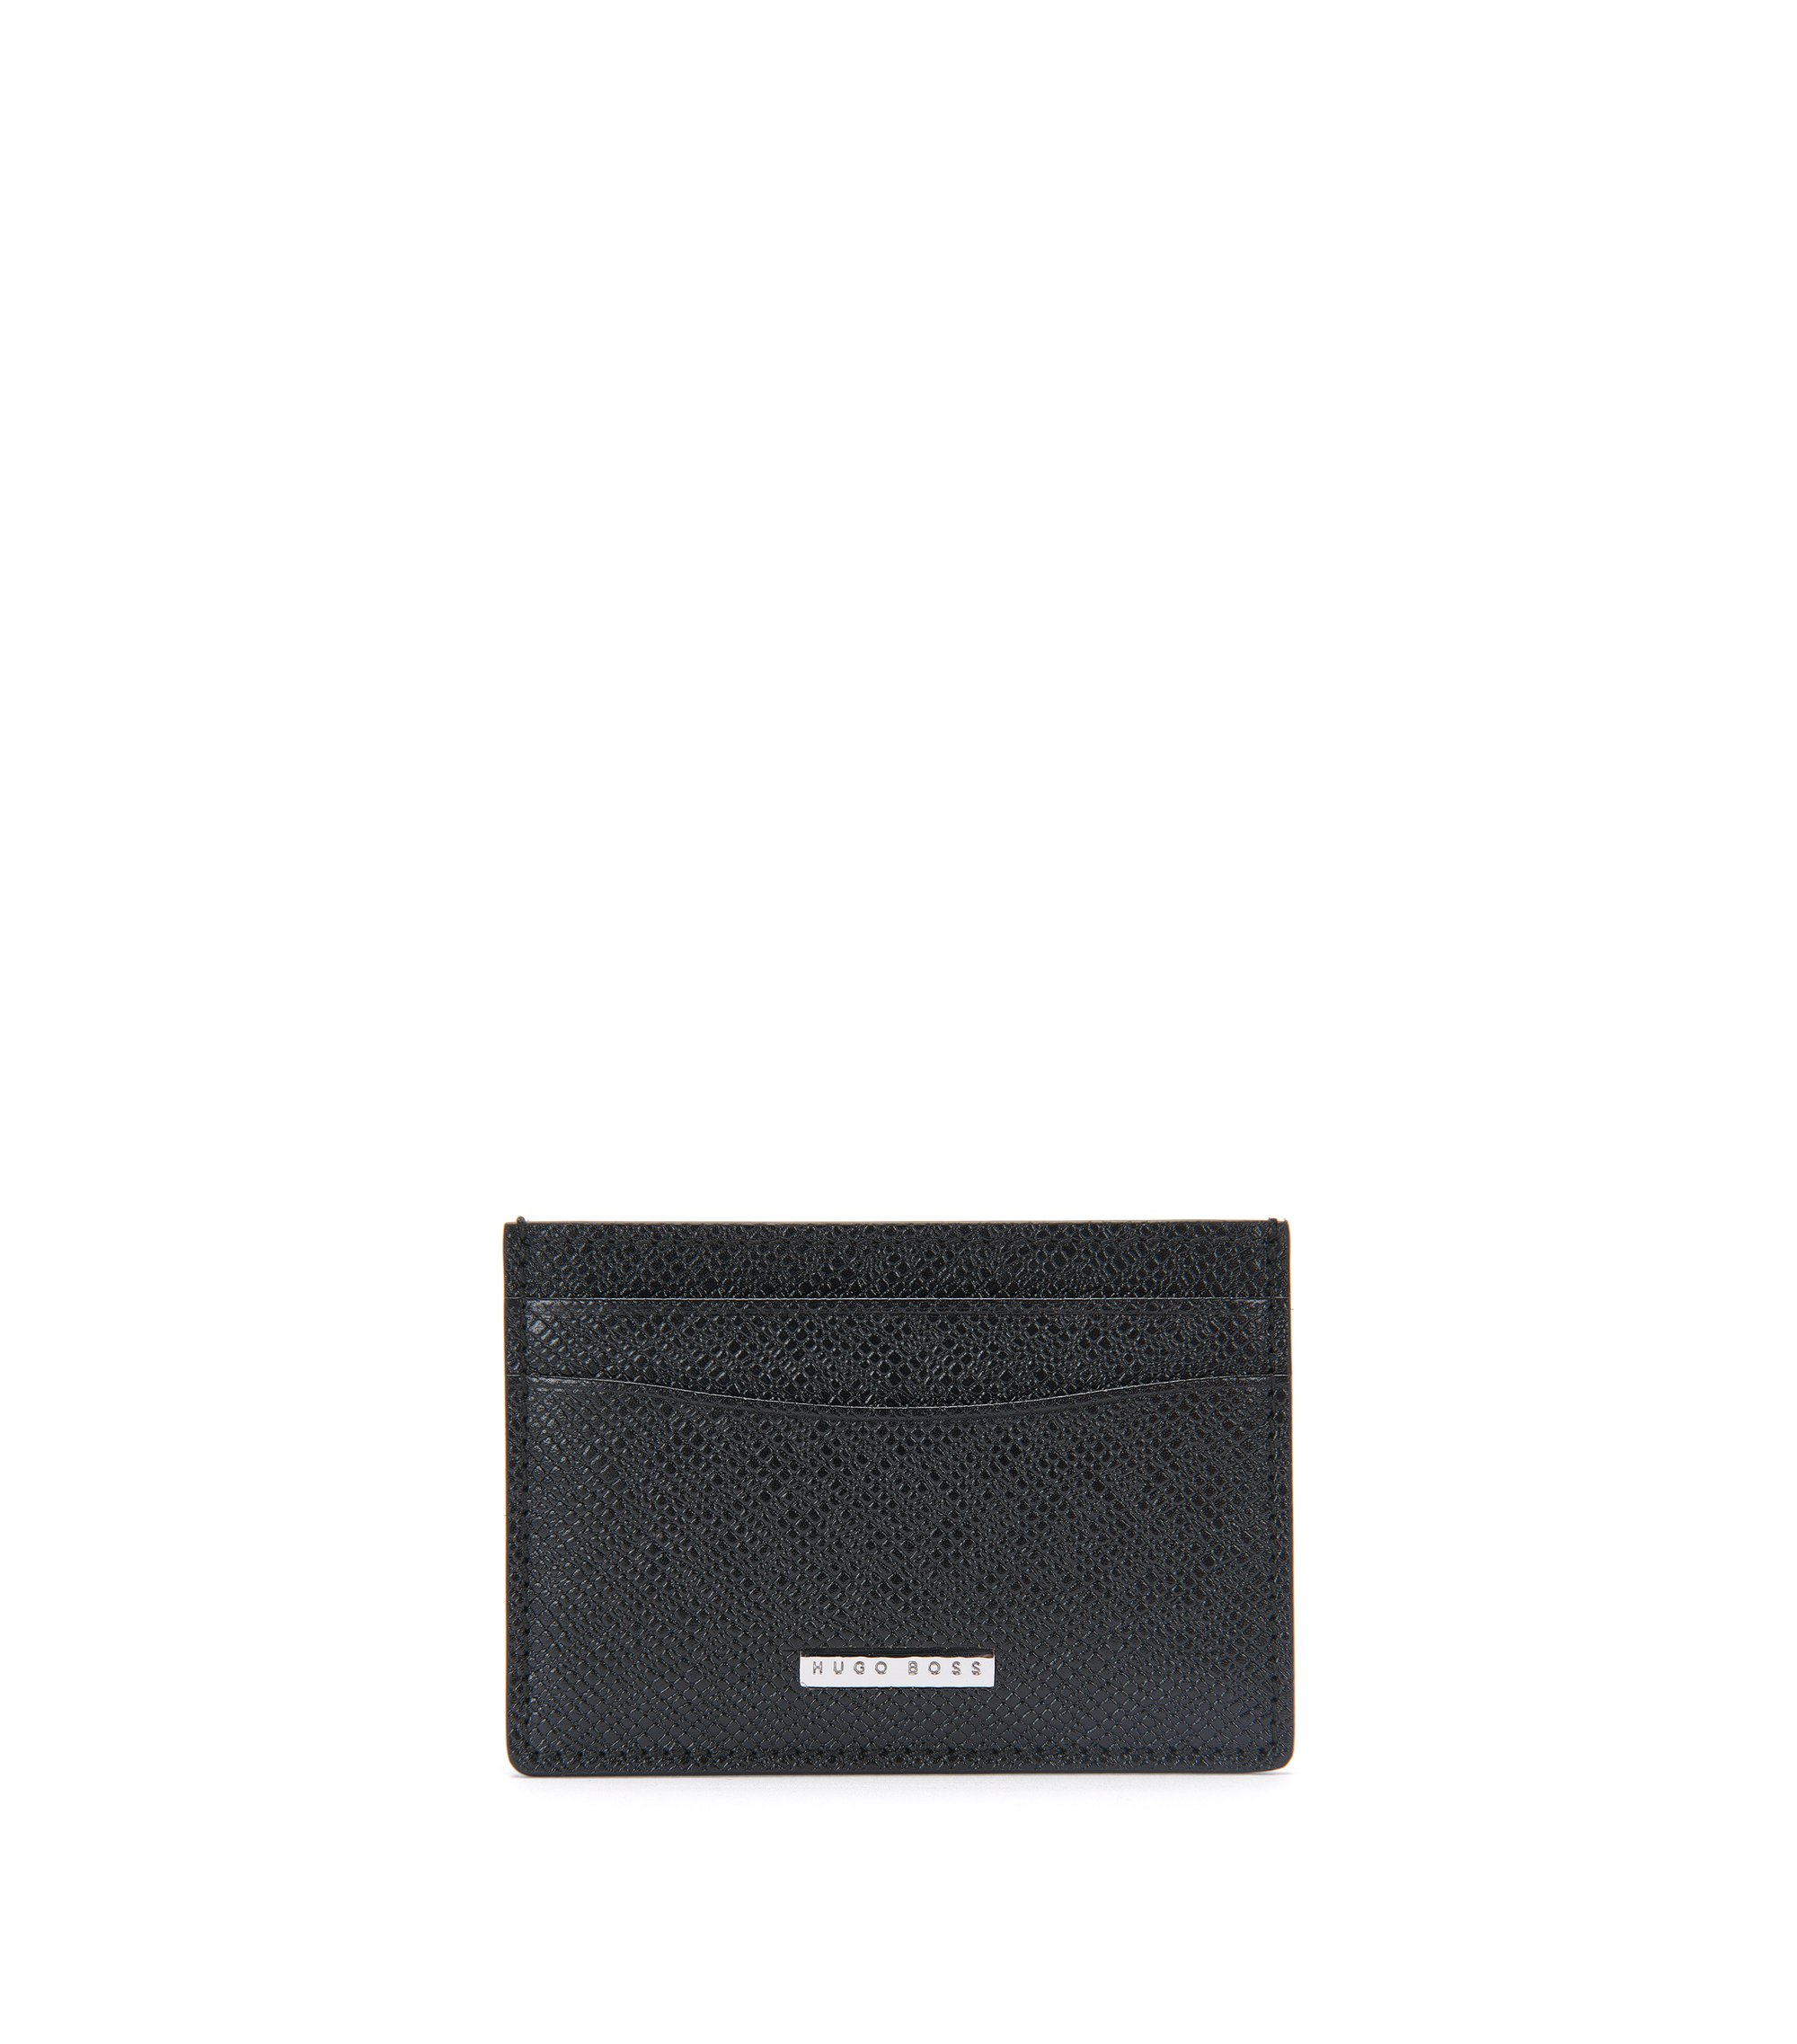 'Signature CC Window' | Calfskin Card Case with ID Window, Black